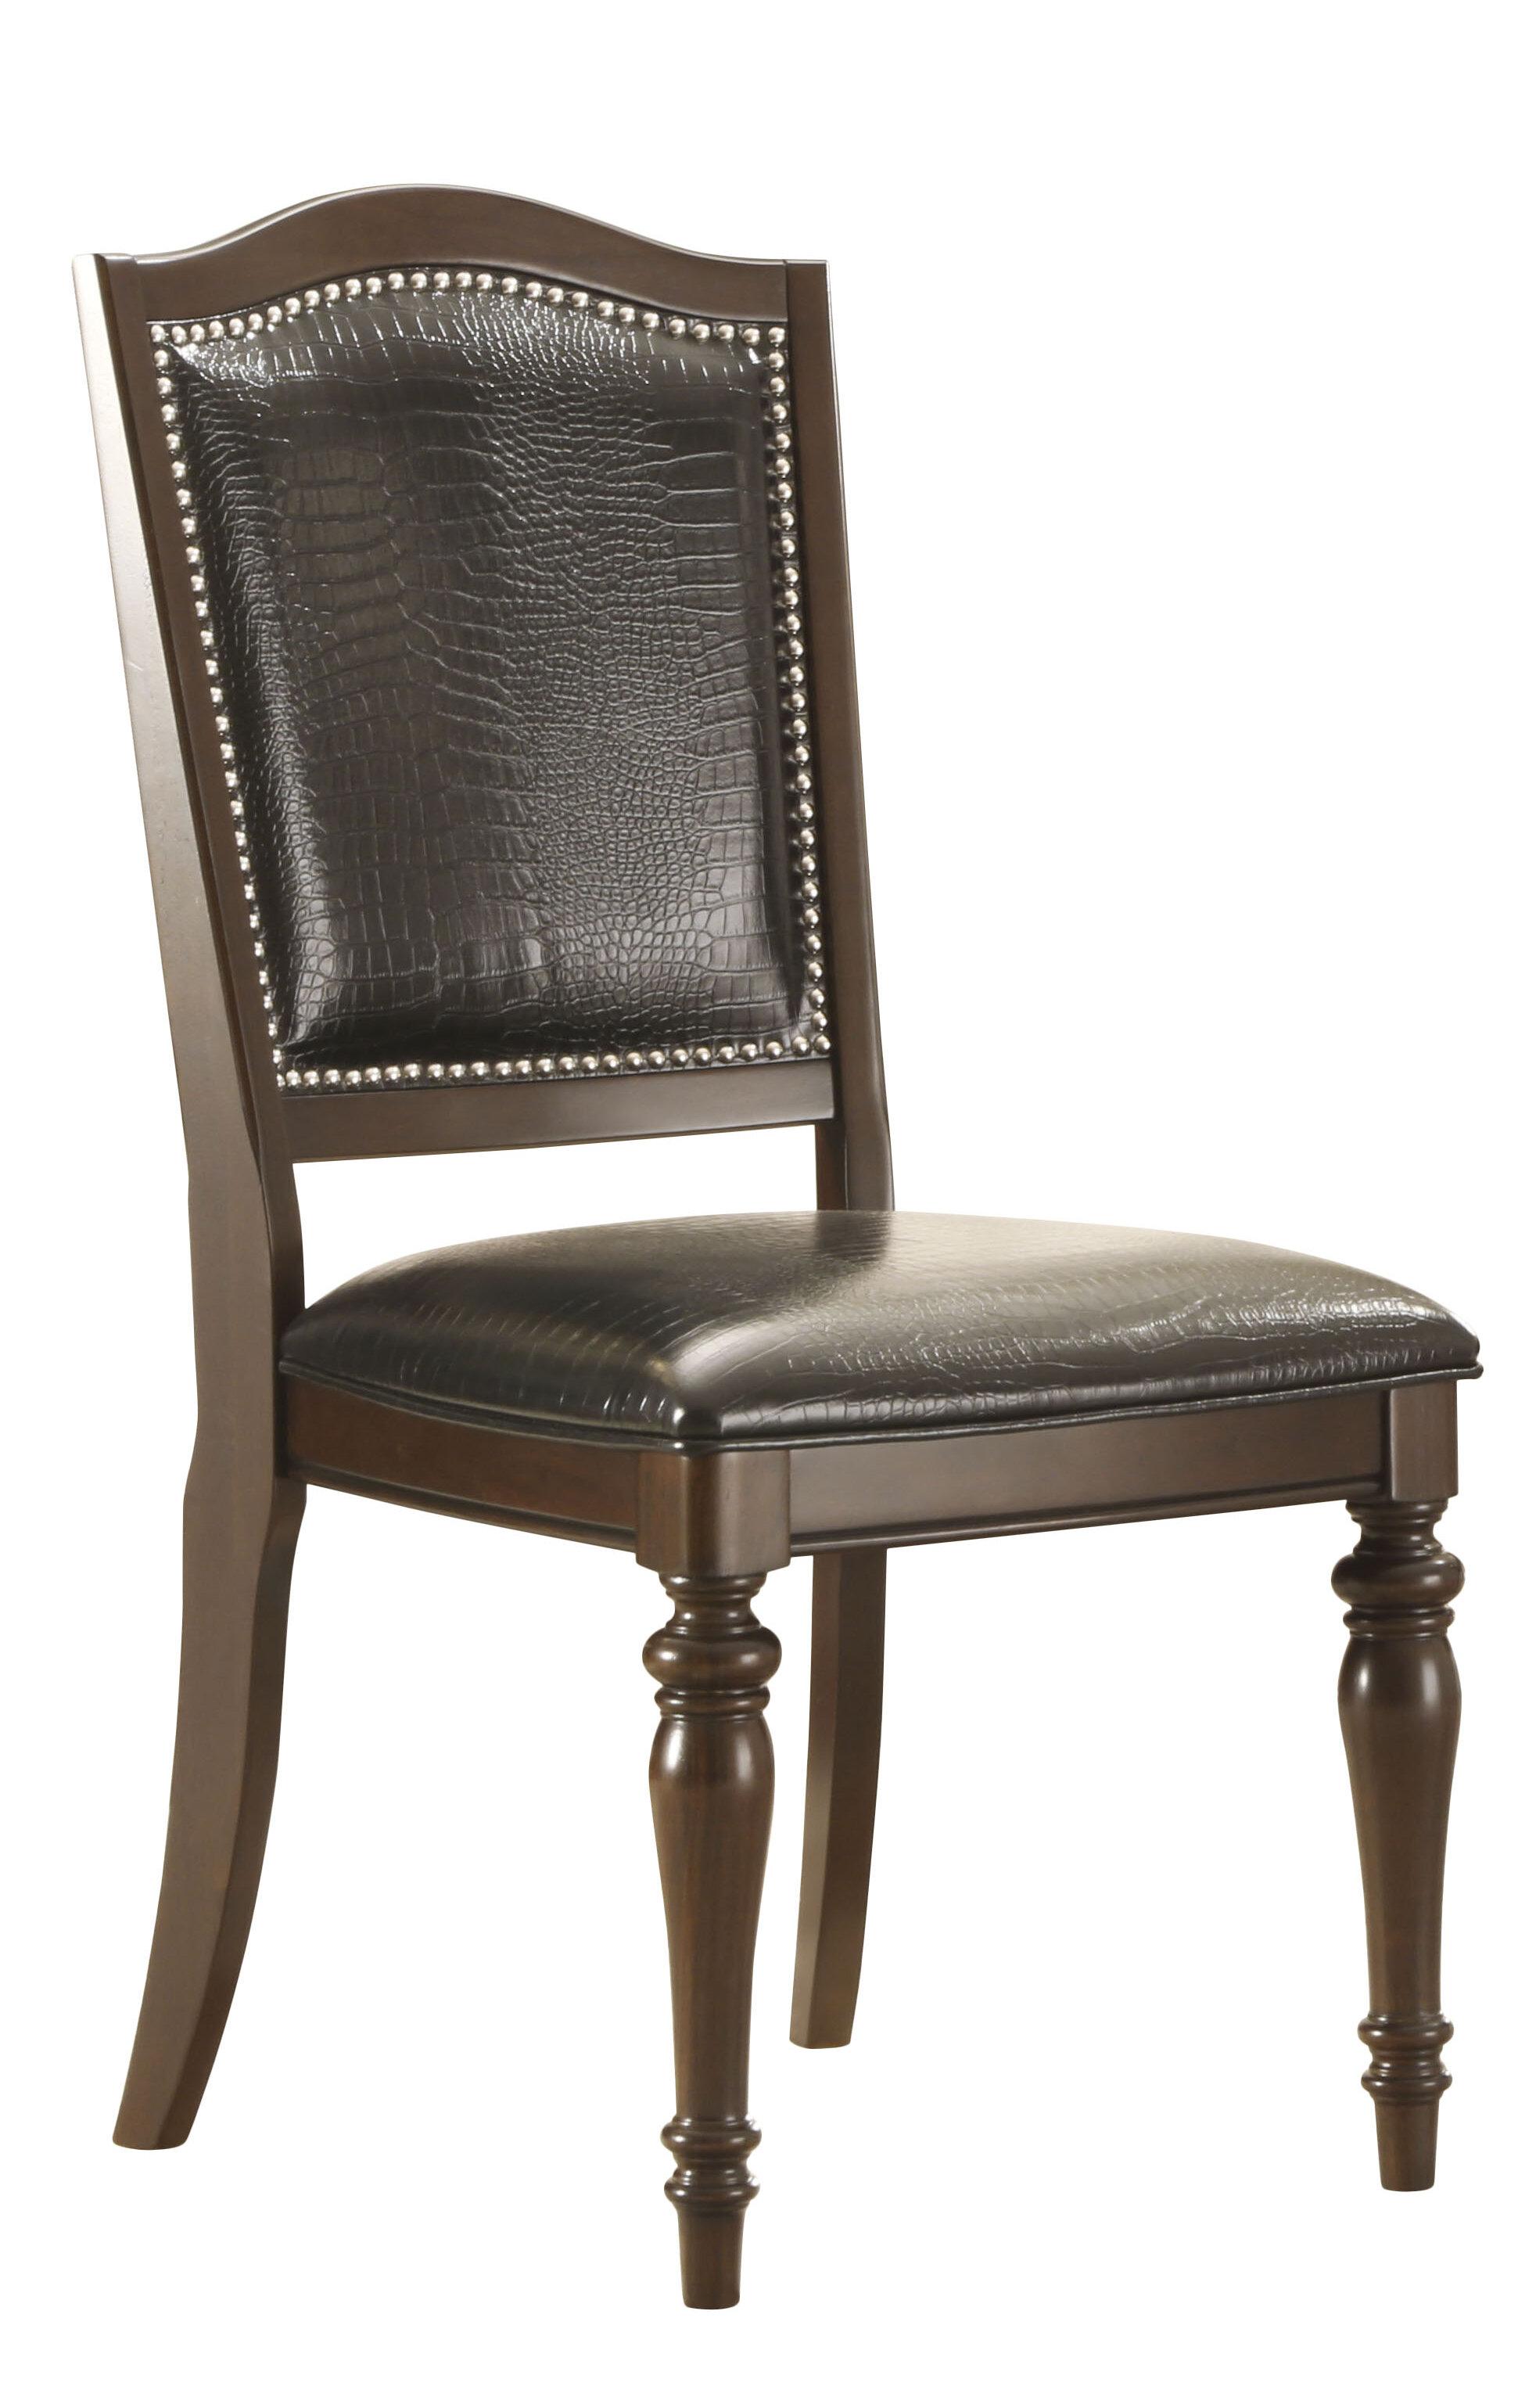 Darby Home Co Hobart Side Chair & Reviews   Wayfair